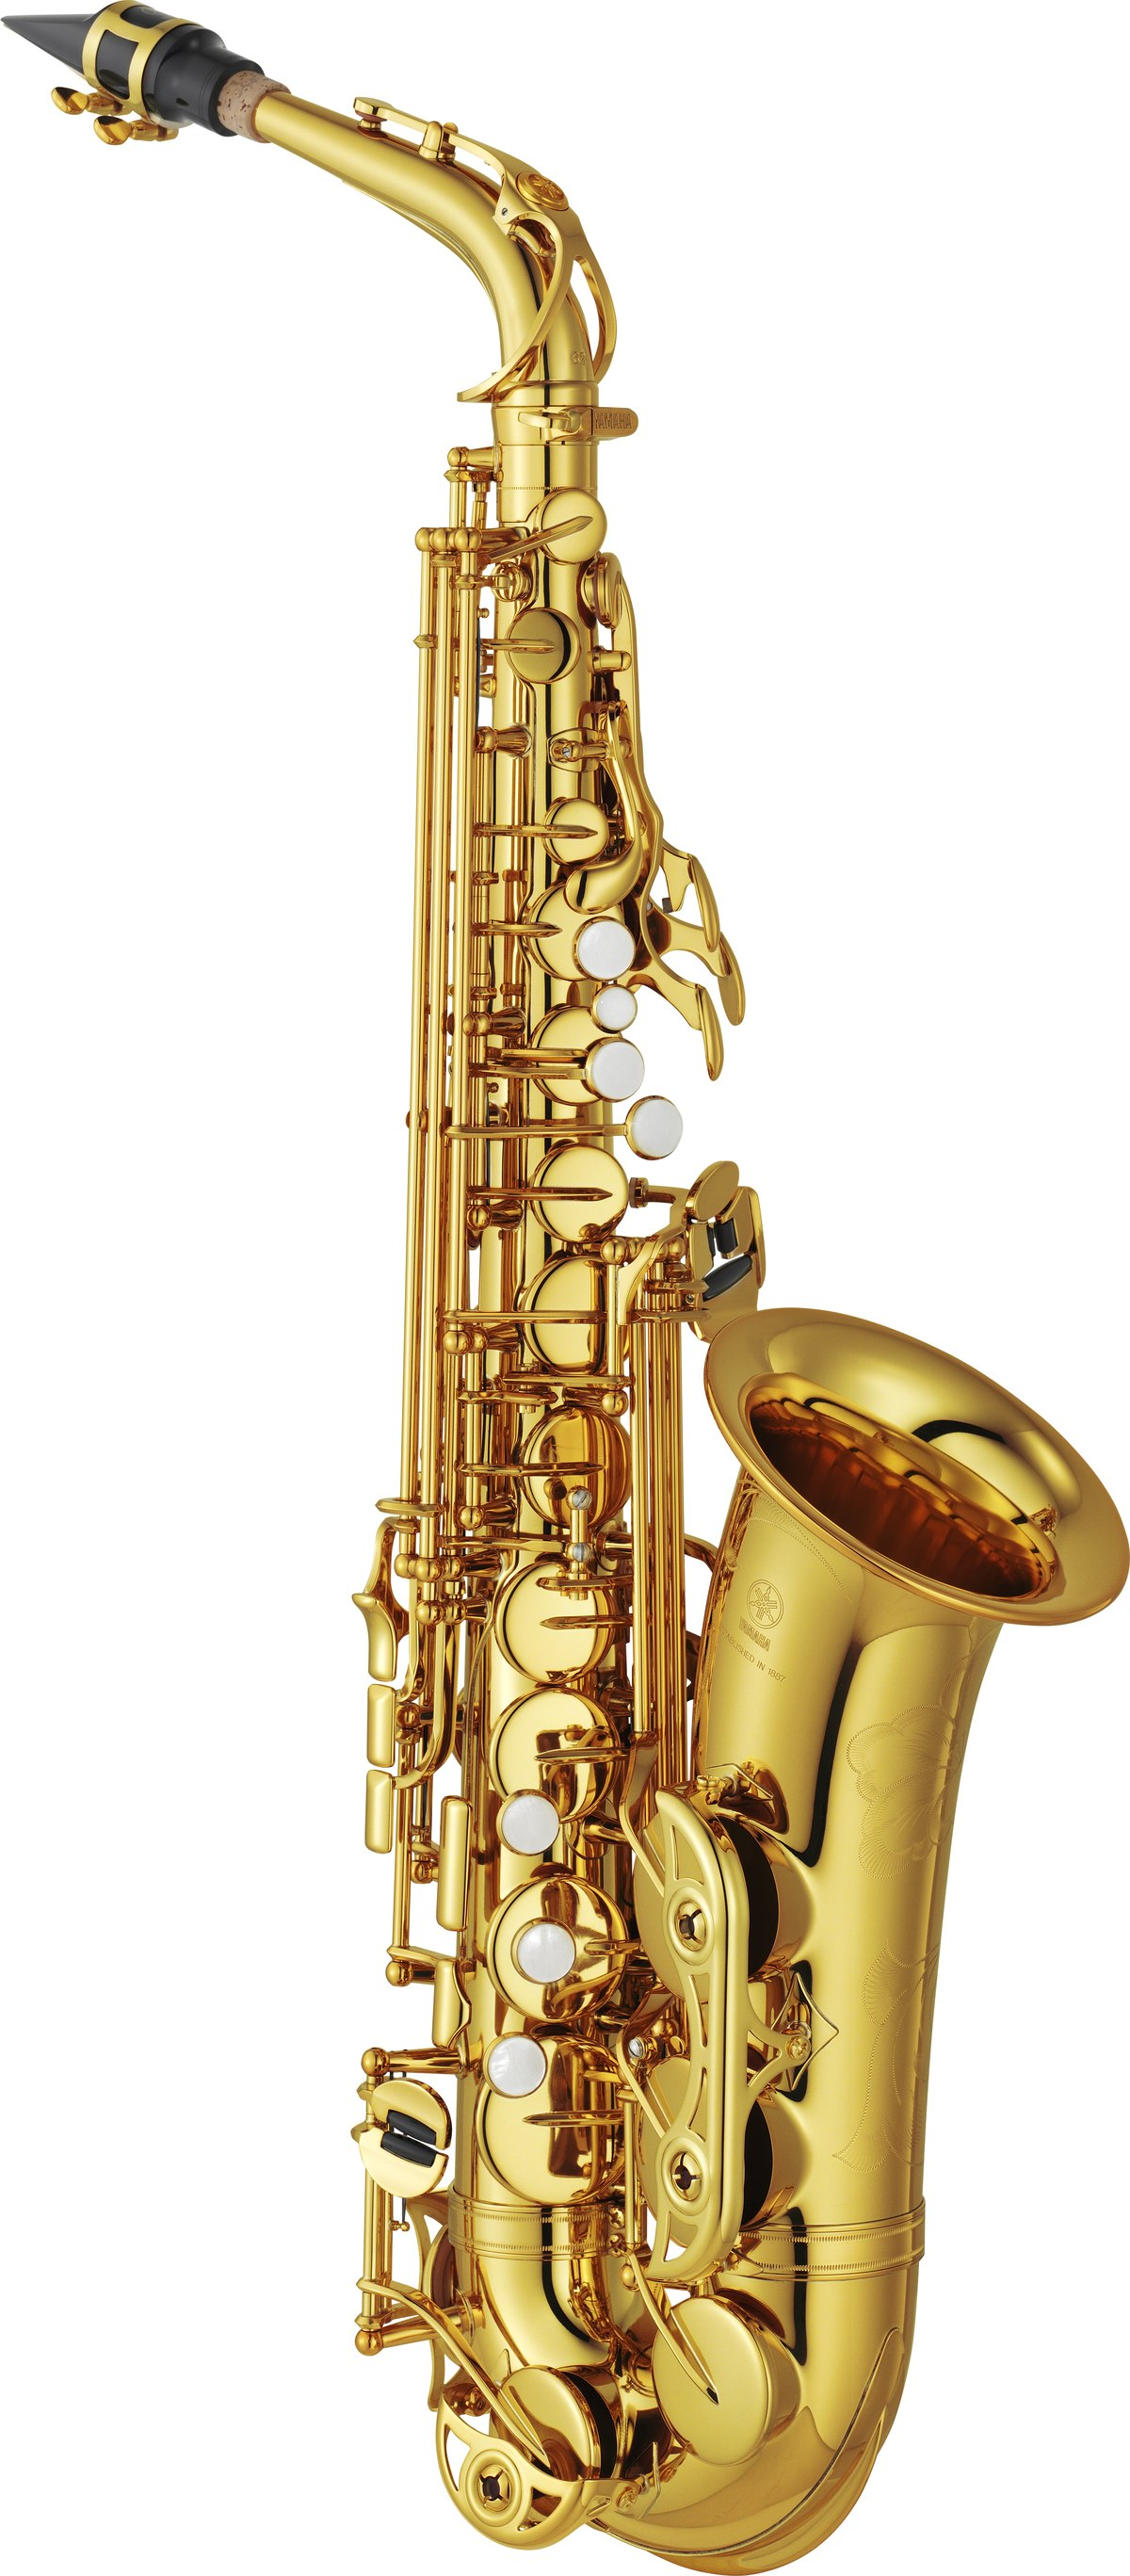 Yamaha  Saxophone Site Craigslist Org